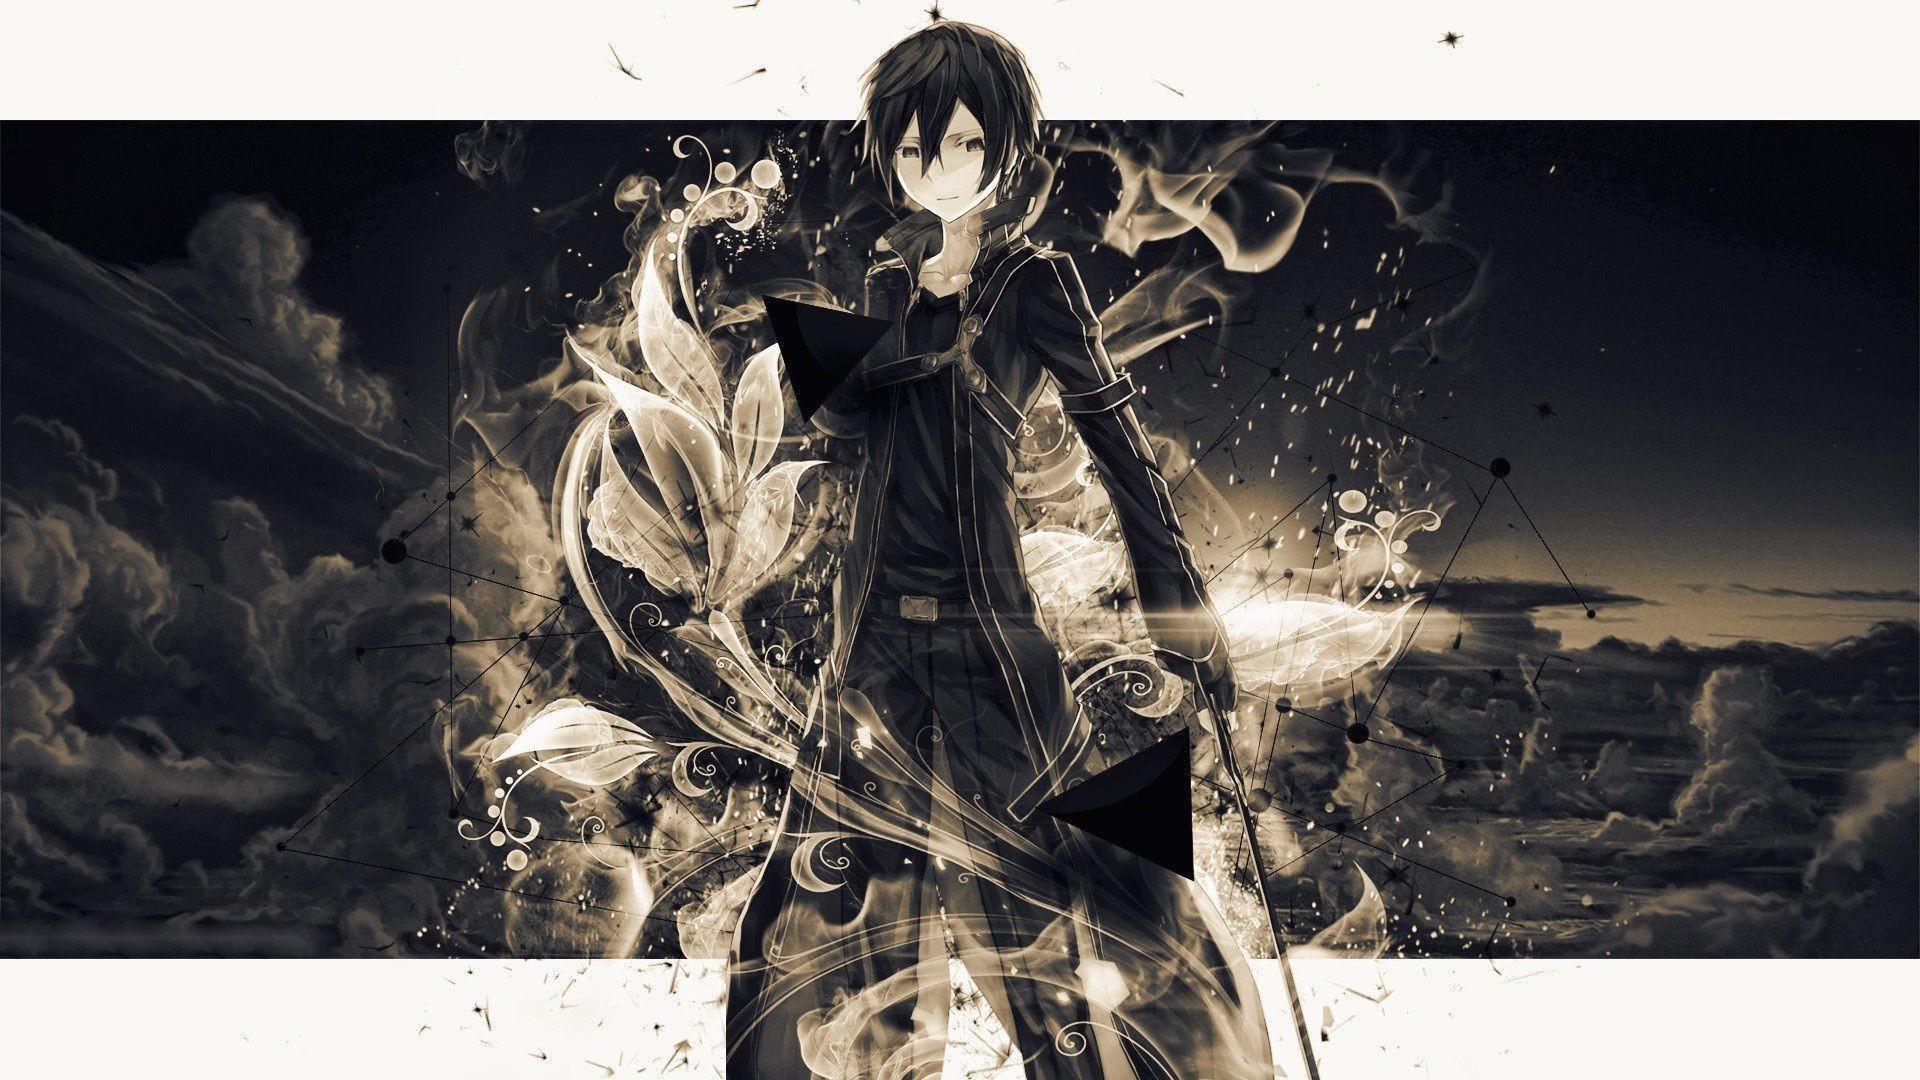 kirito-sword-art-online-anime-hd-wallpaper-1920×1080-